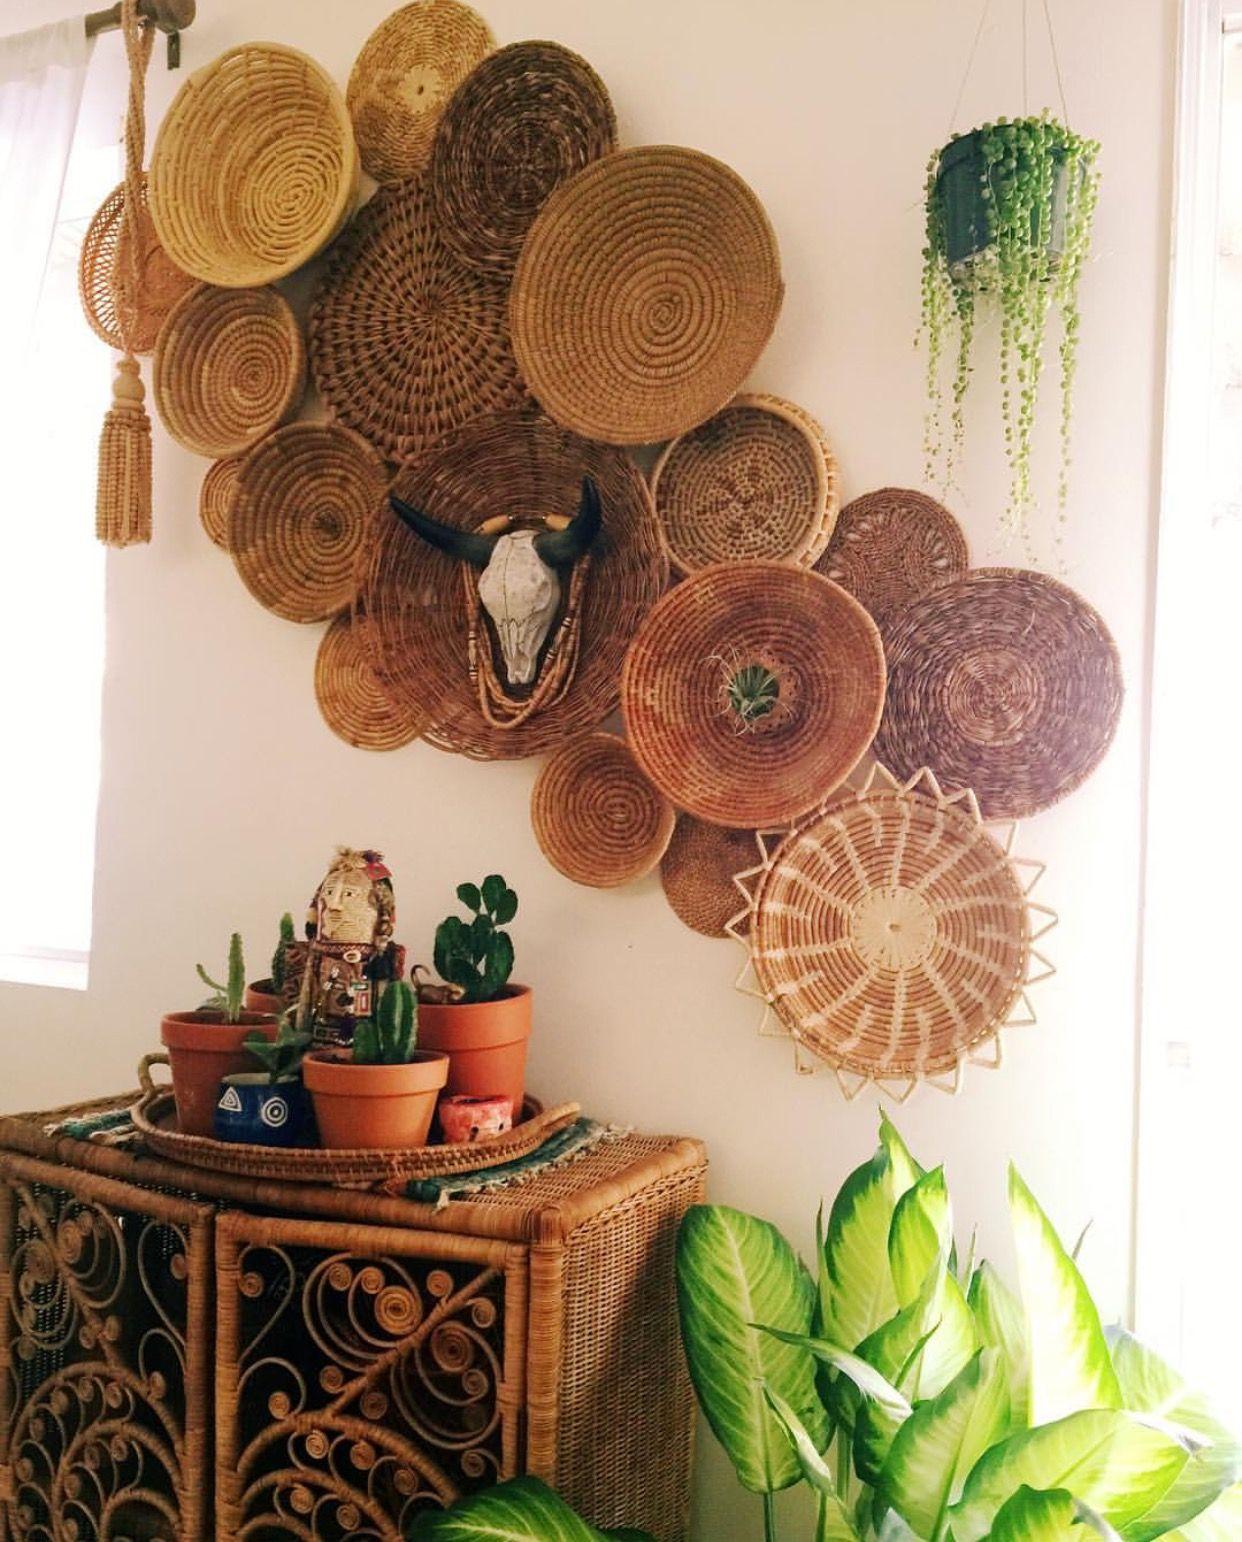 Pinterest ↠savana_rollins↠ Contemporary home decor